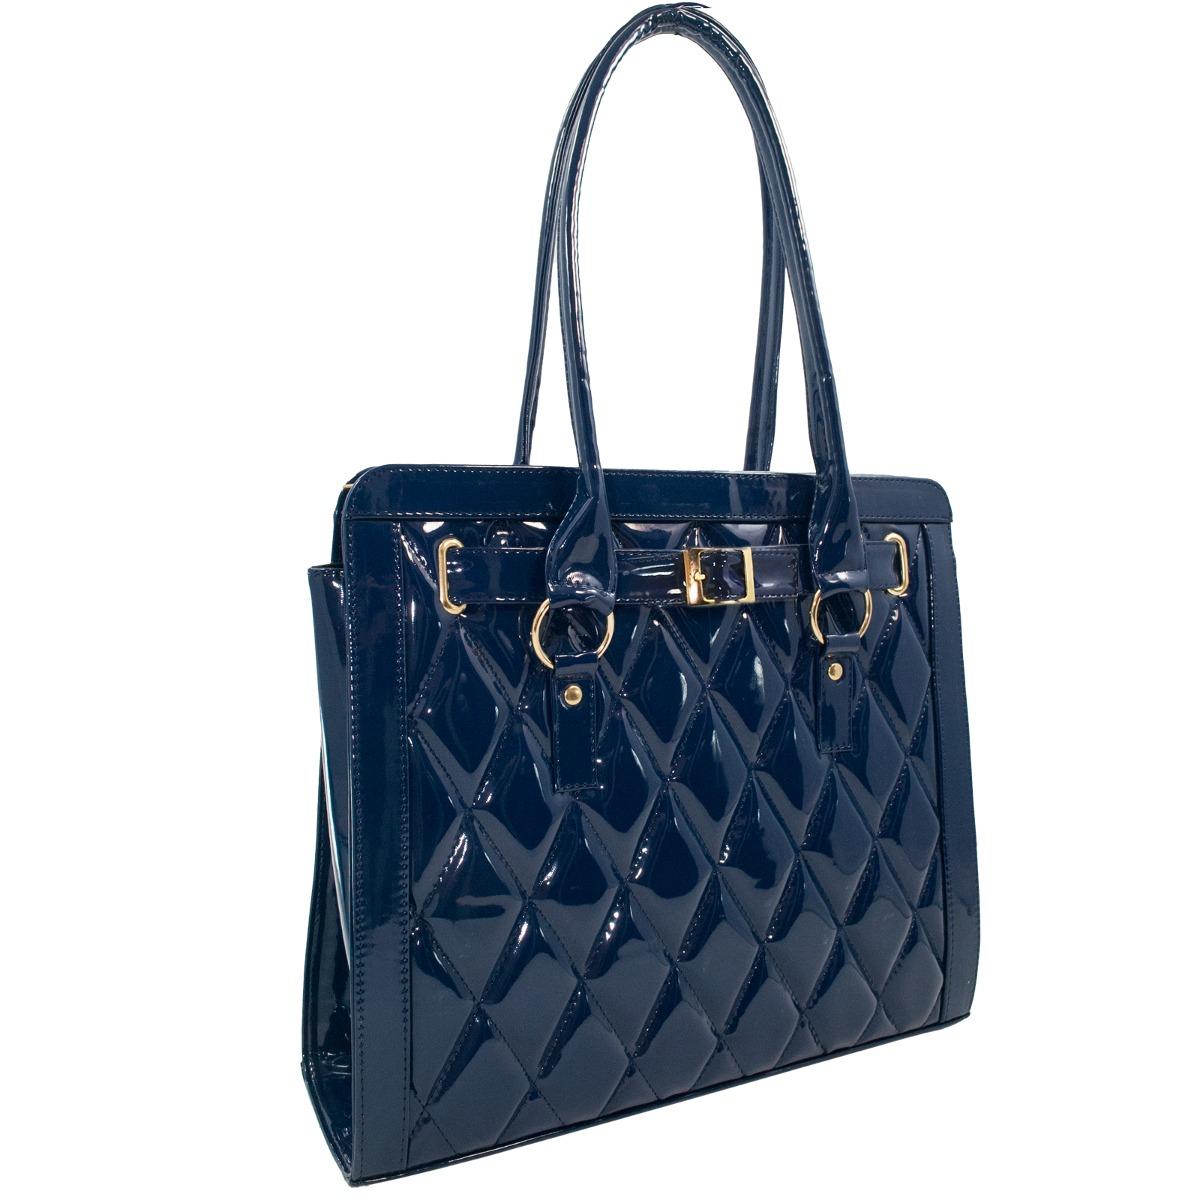 af5c71e6a elegantes bolsos de dama temporada 2016. marca bajío fashion. Cargando zoom.